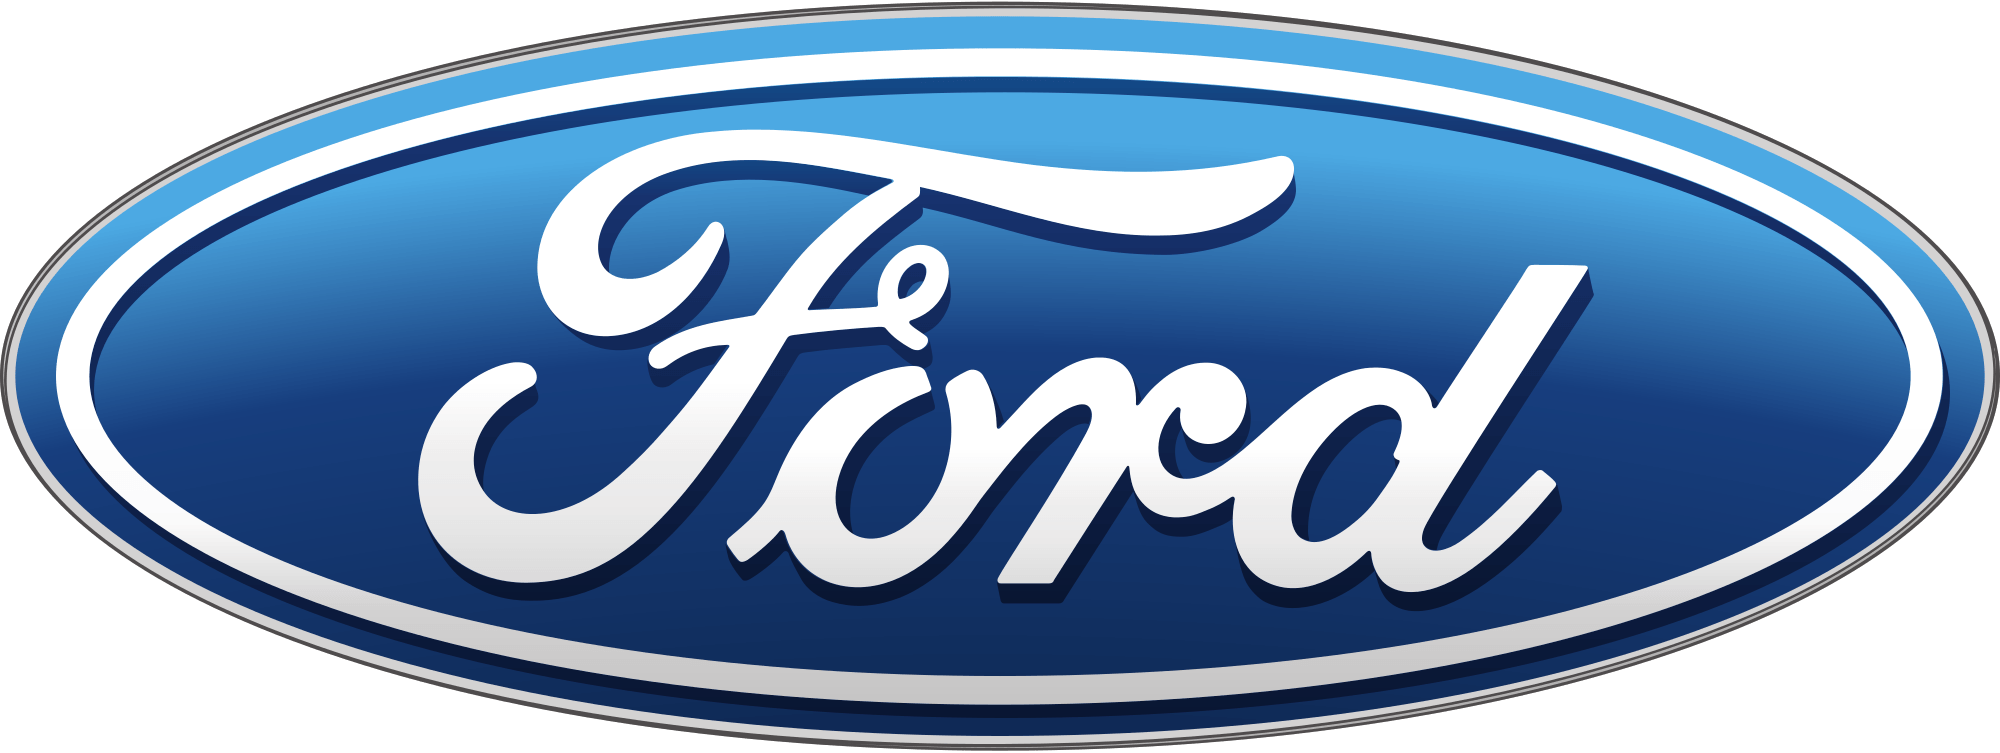 Testy kvality servisu Ford